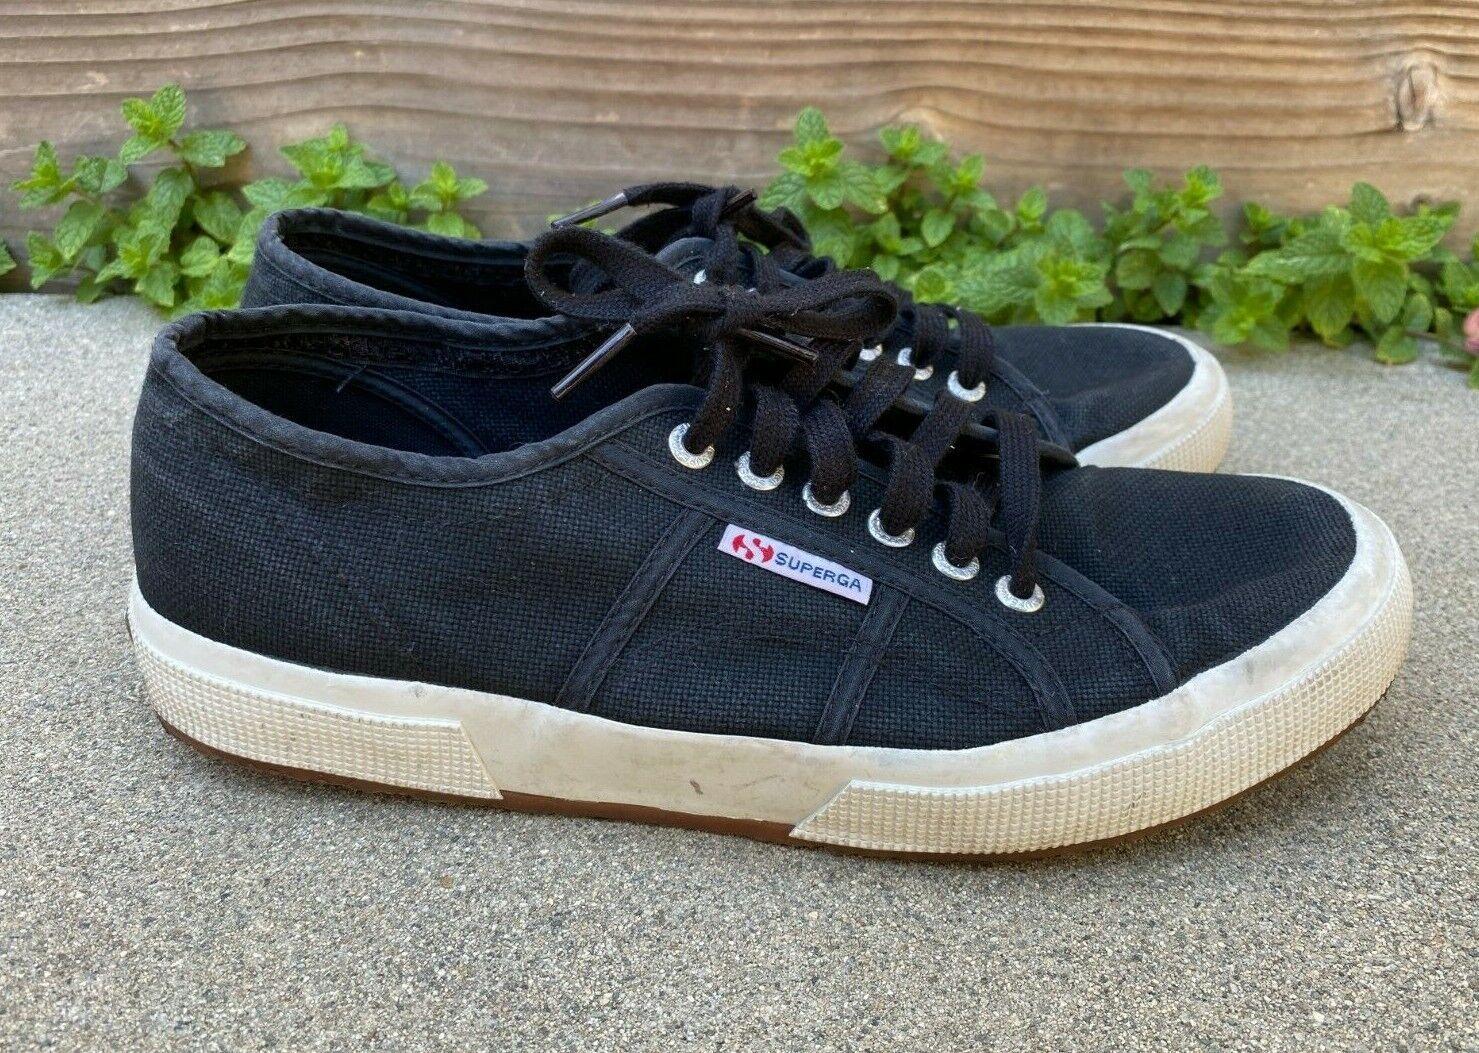 SUPERGA Women's Black Cotu Canvas Sneakers Shoes   41 1/2 US 10